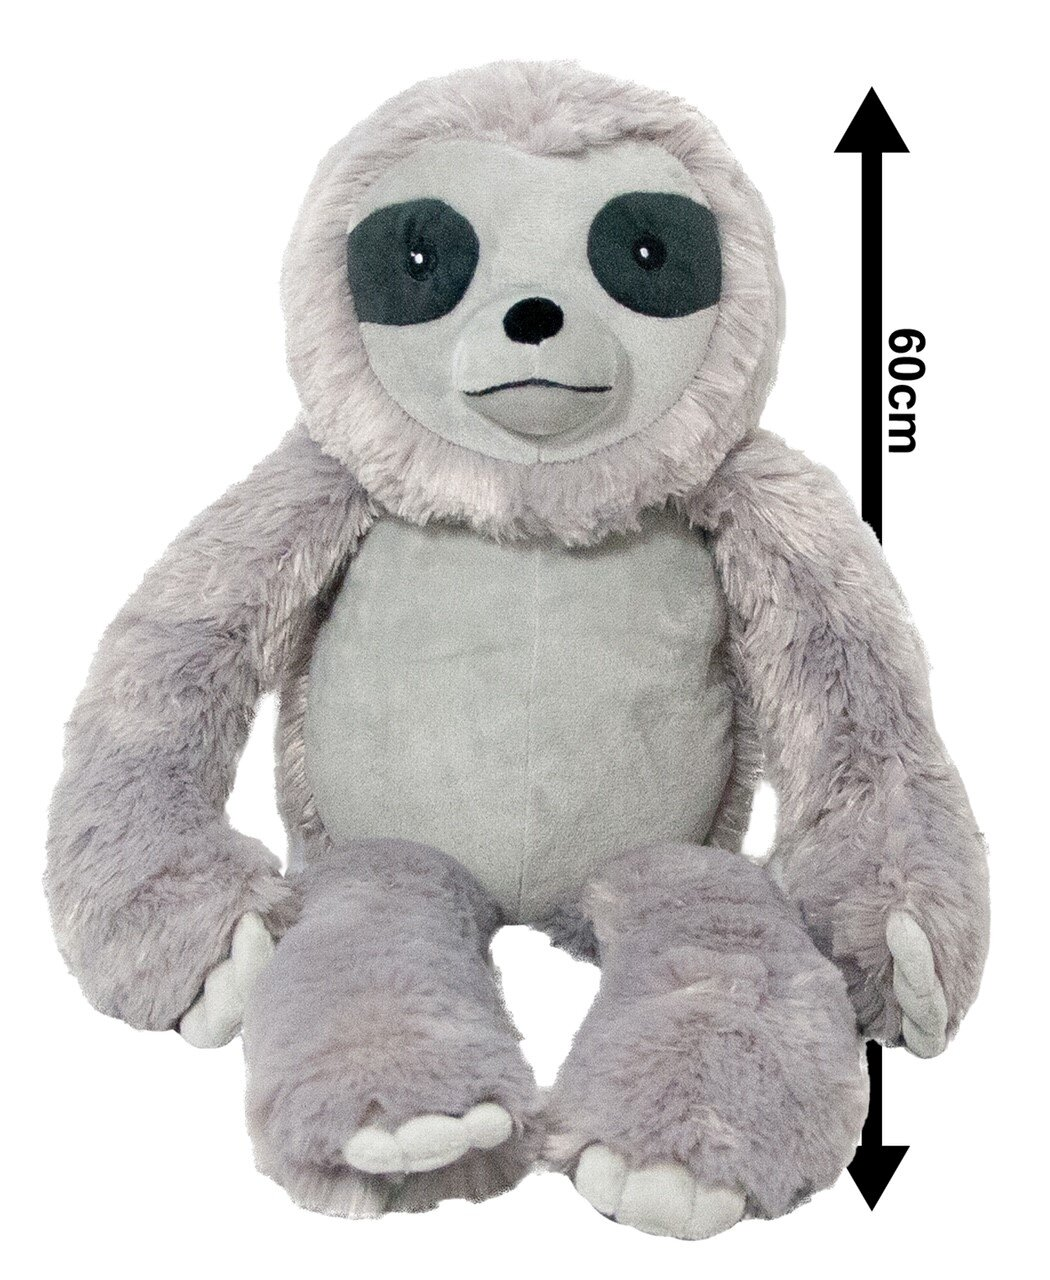 Dog Life Softie Super Sloth 80cm x 3